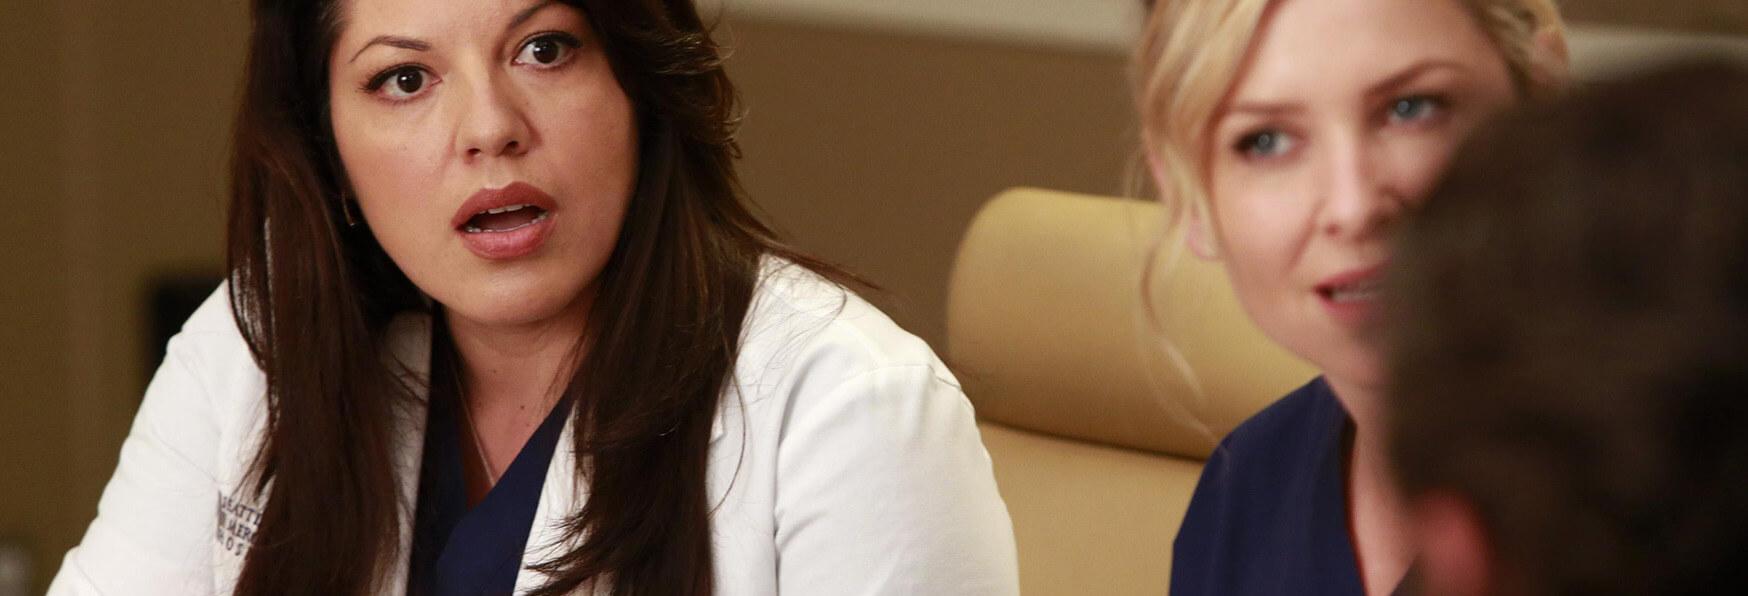 Sara Ramirez doveva tornare nell'ultima puntata di Grey's Anatomy